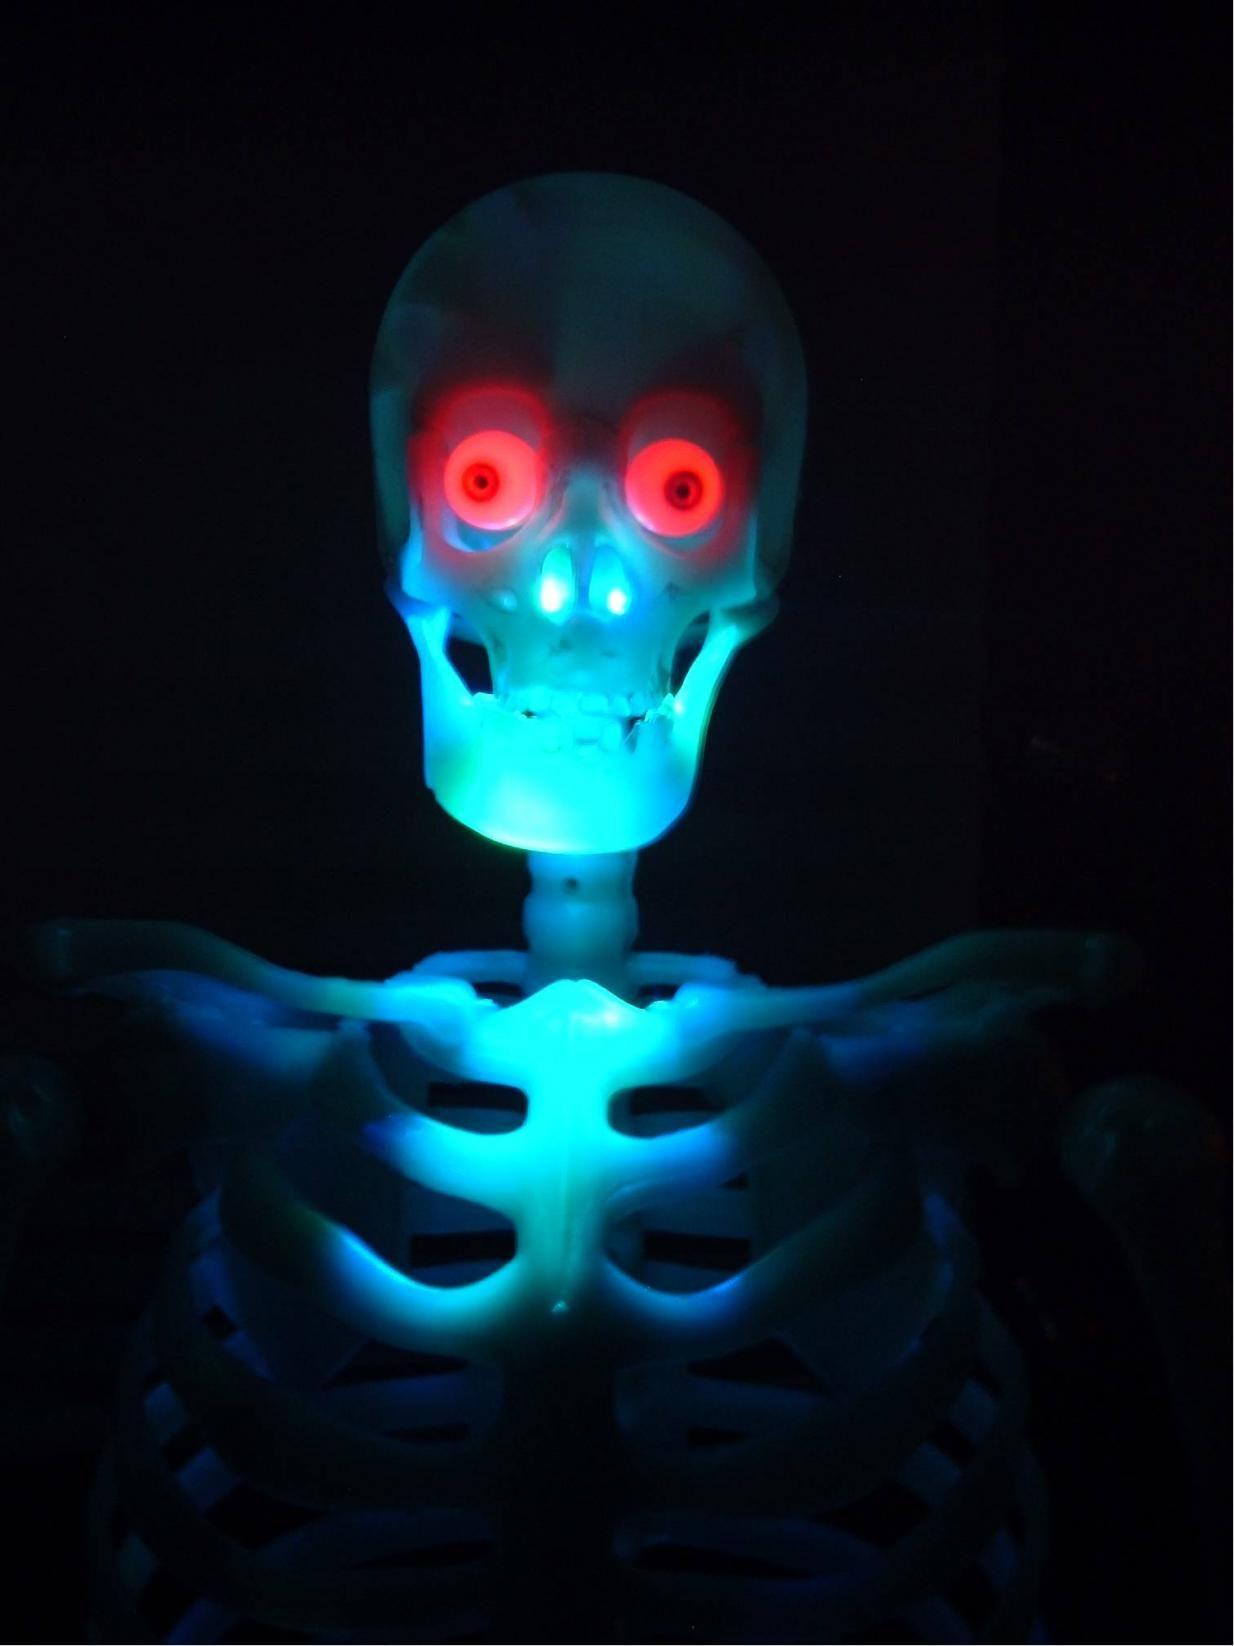 Static glow in the dark skelly Halloween 2015 - Glow-in-the-Dark - glow in the dark halloween decorations